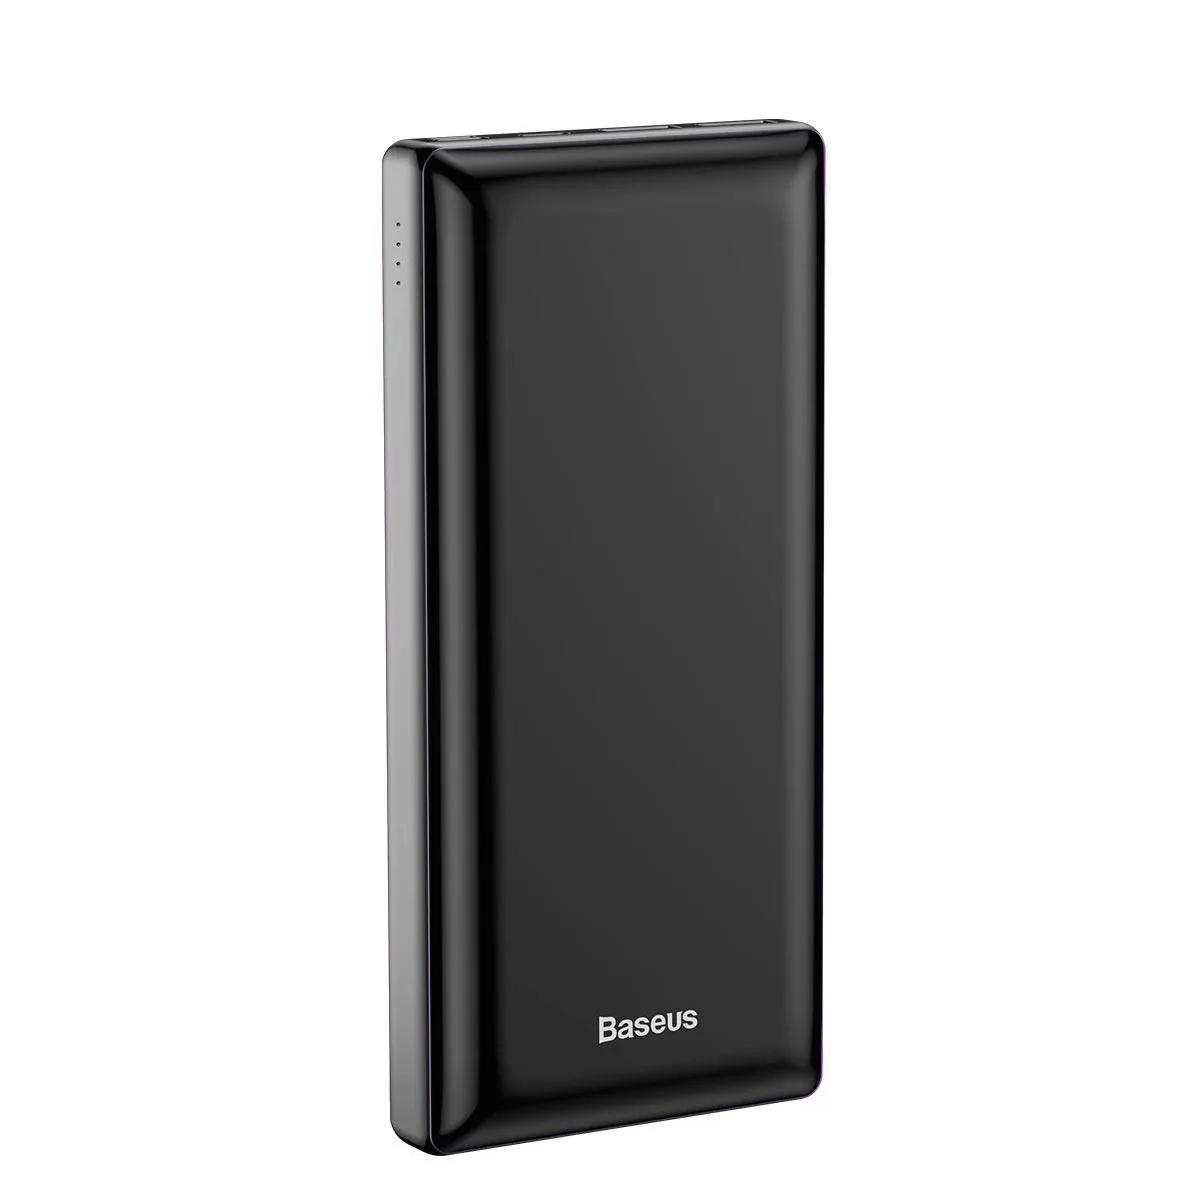 Carregador Portátil Baseus Power Bank Turbo PD 30000mAh Black (Ref. PPJAN-C01)